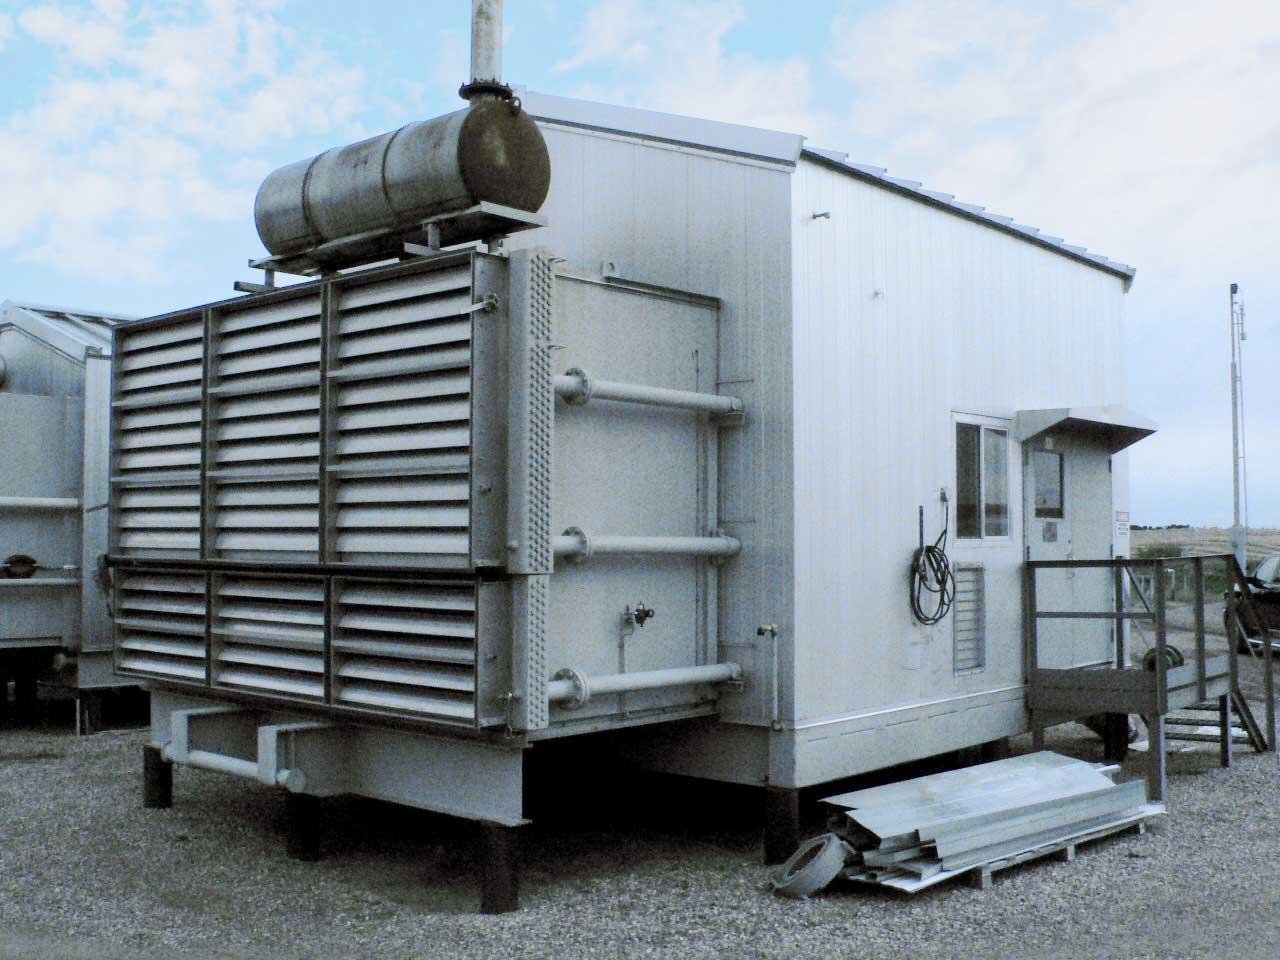 Used 400HP Waukesha Screw Compressor for sale in Alberta